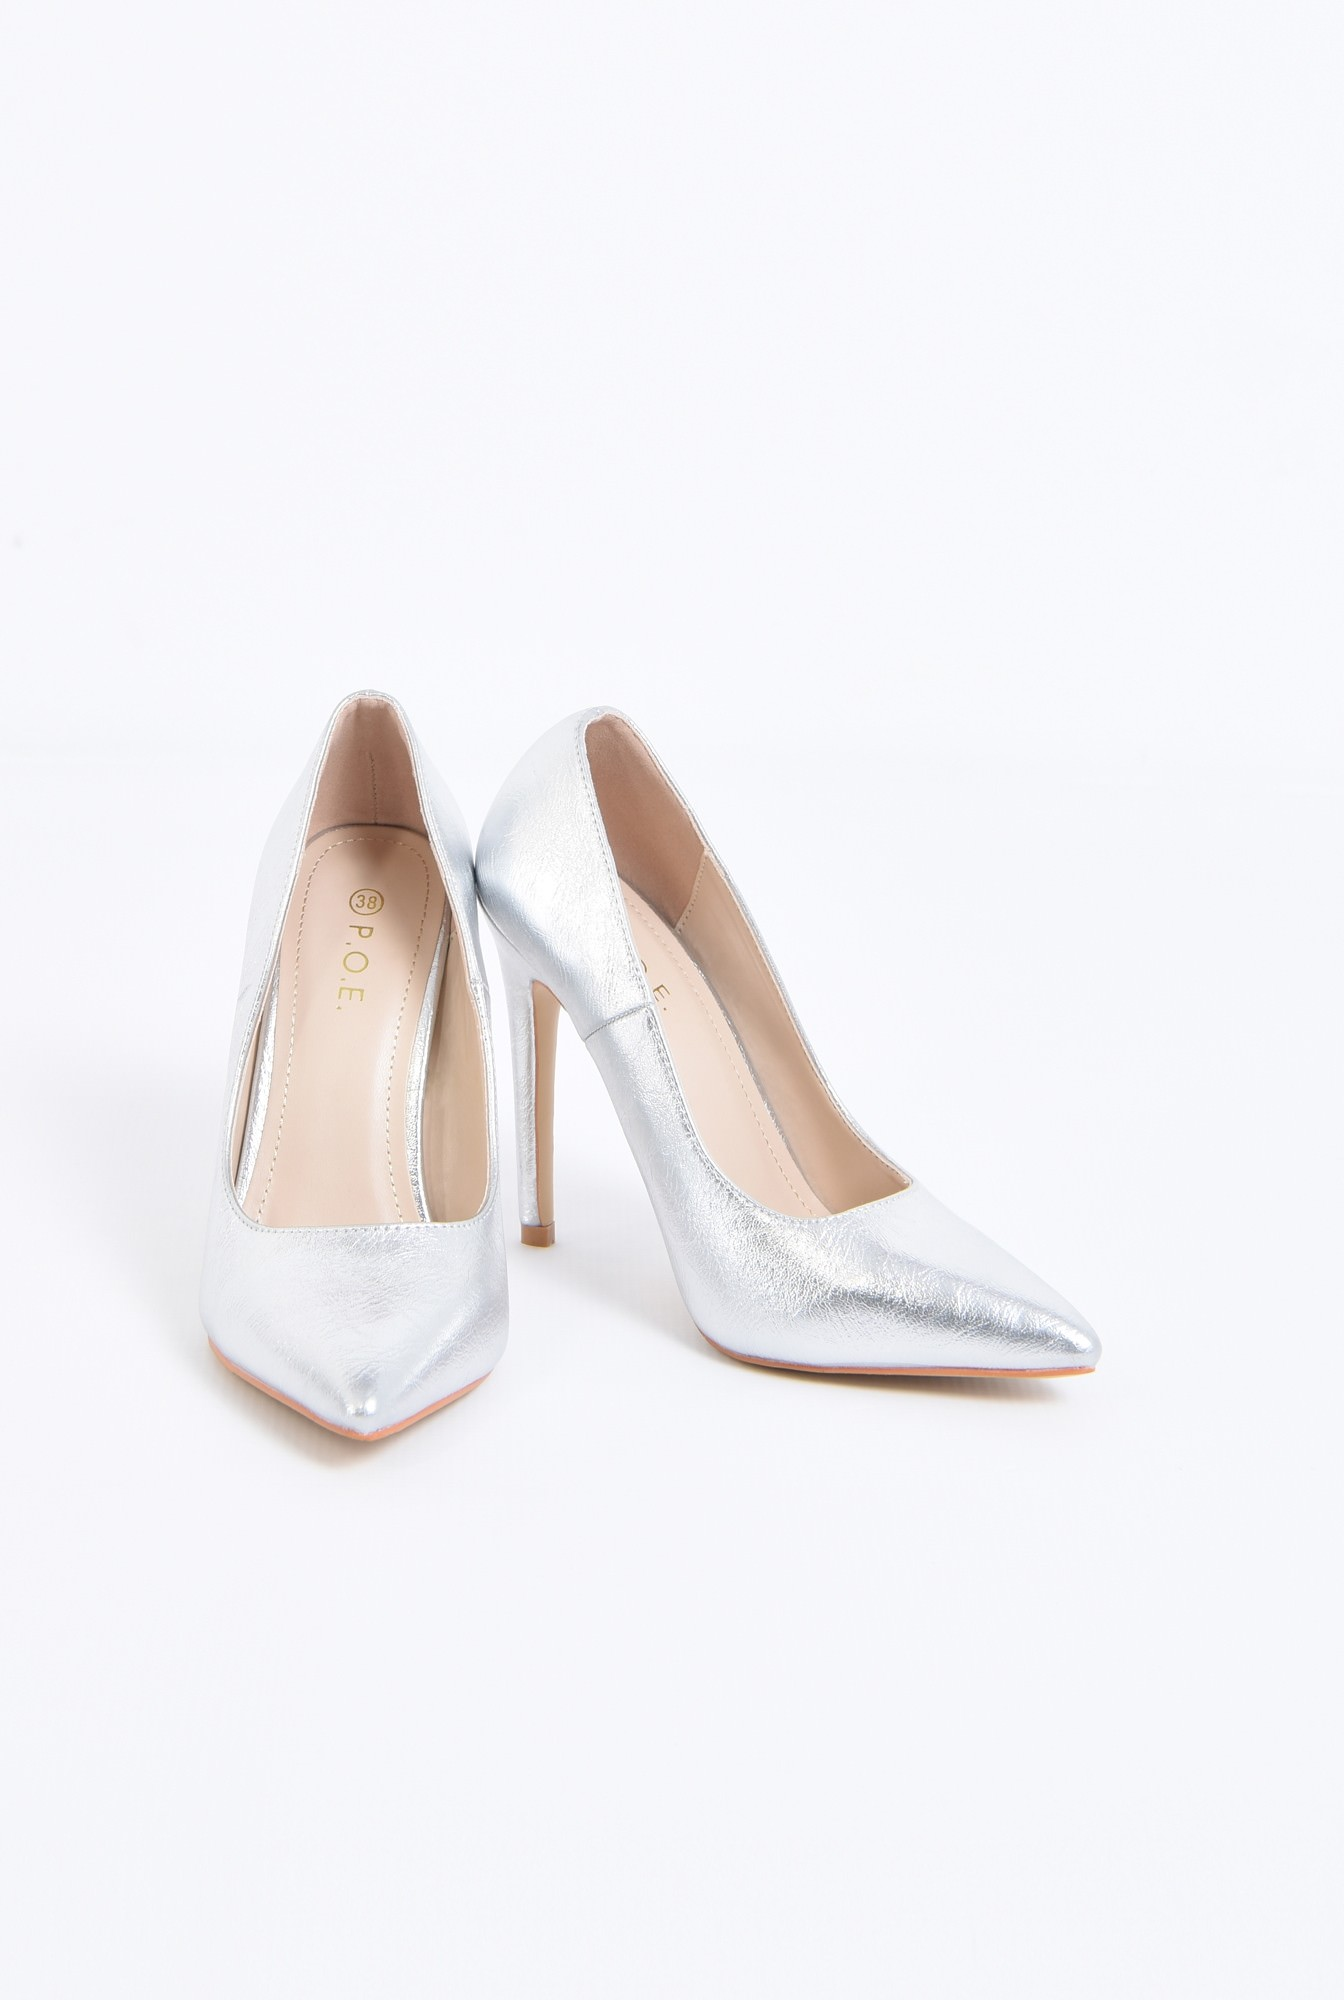 3 - pantofi dama, stiletto, argintiu, metalic